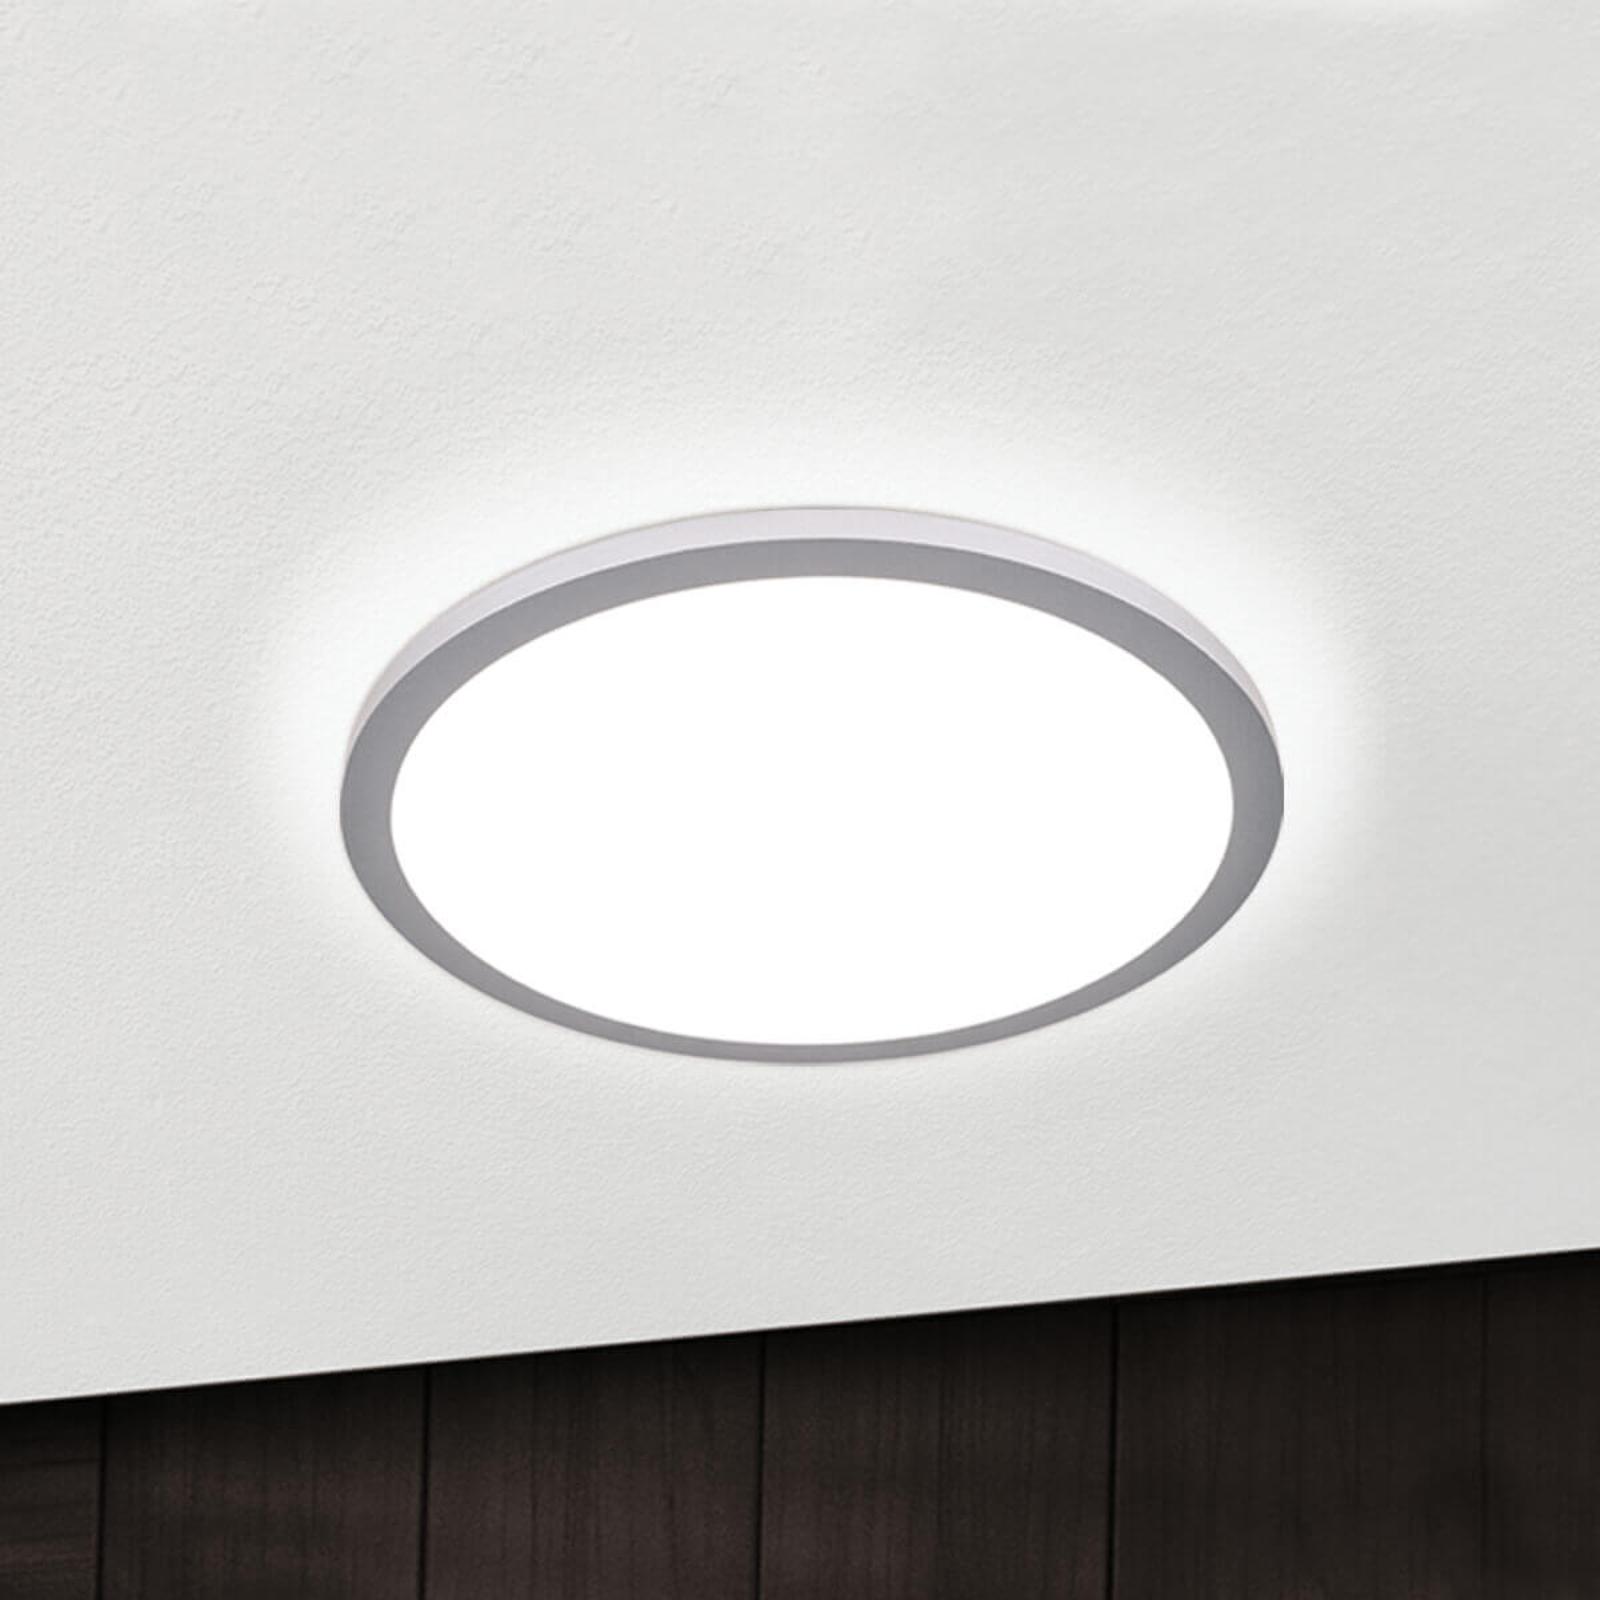 Lampa sufitowa LED Aria, jak tytan, 40cm